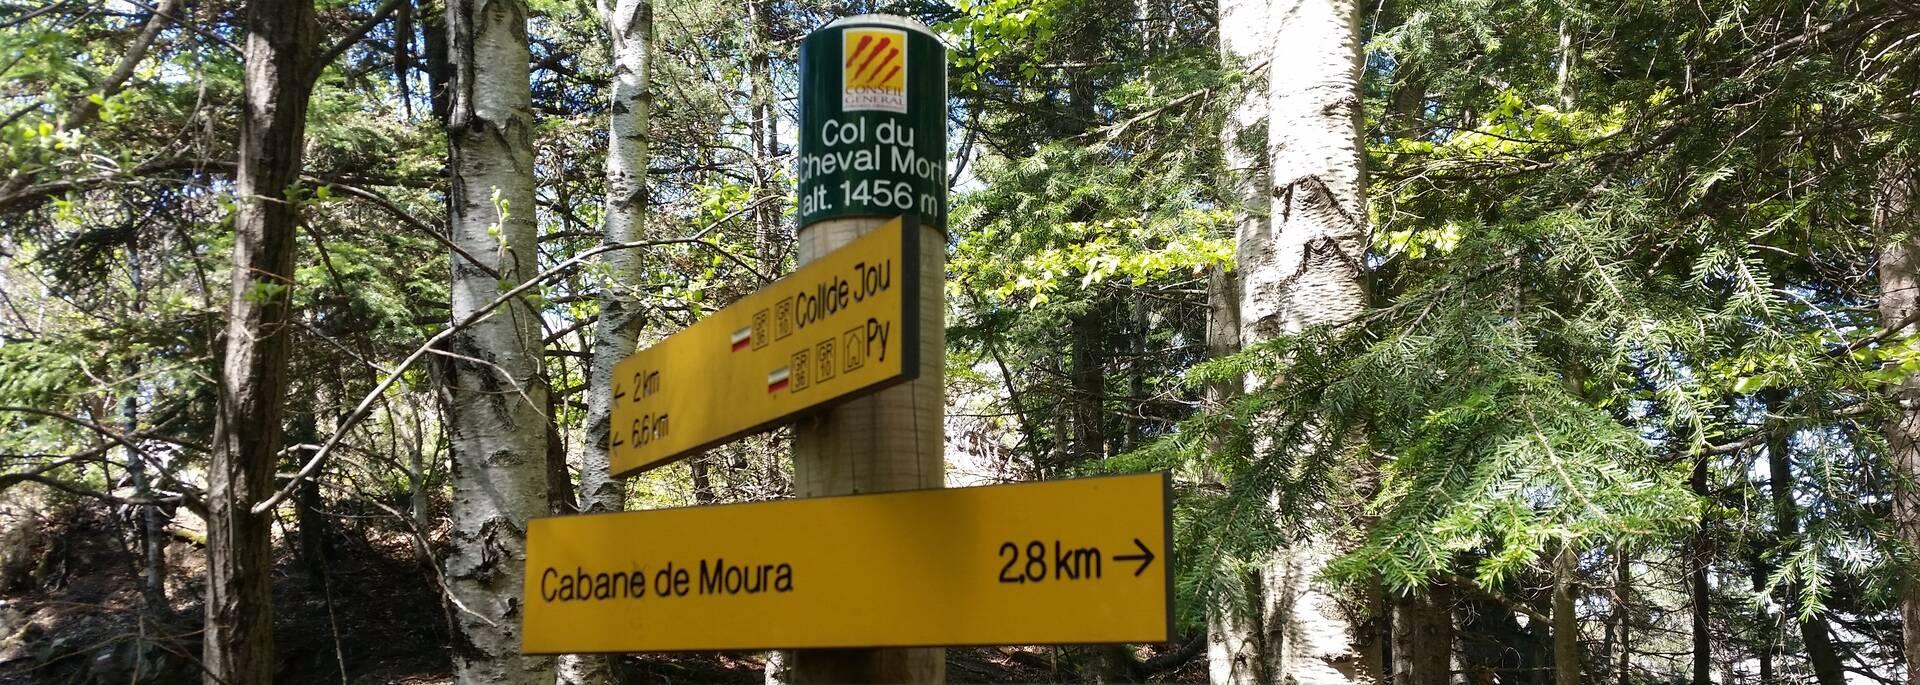 Col du Cheval Mort